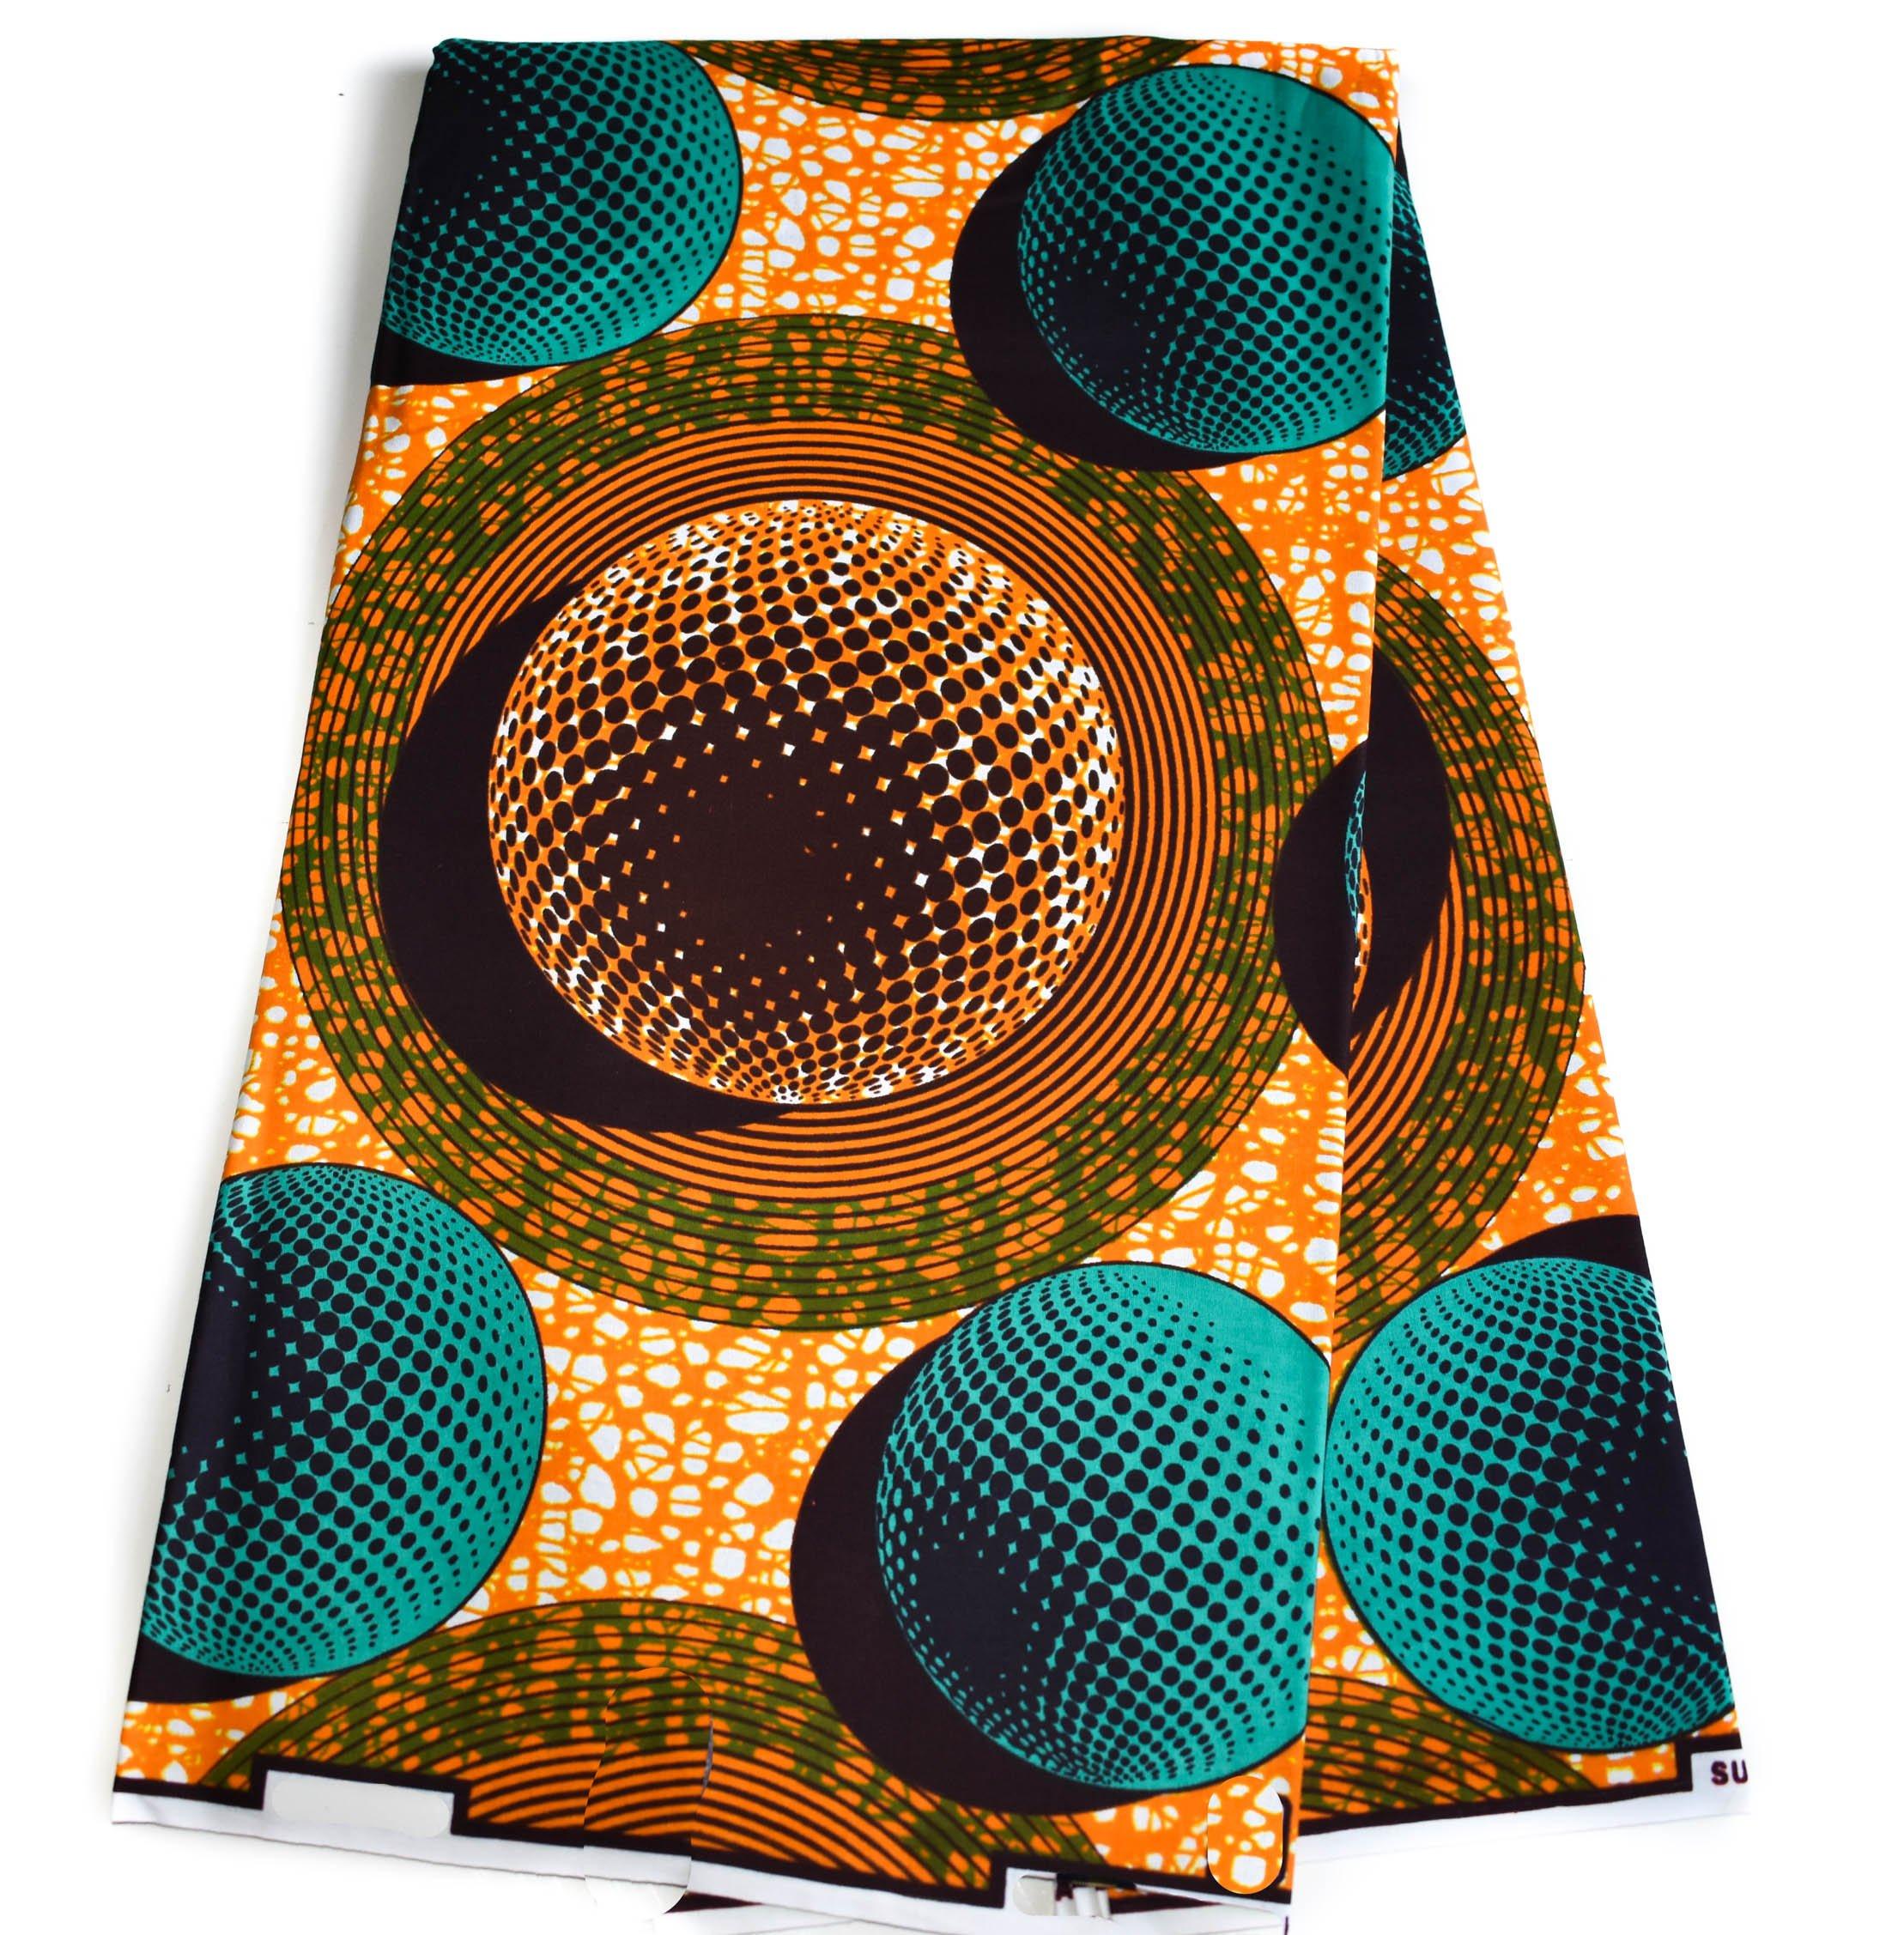 Ankara fabric 6 yards,Ankara fabric,African fabric,African print material,African women fabric,Tecidos Africanos,African American shops